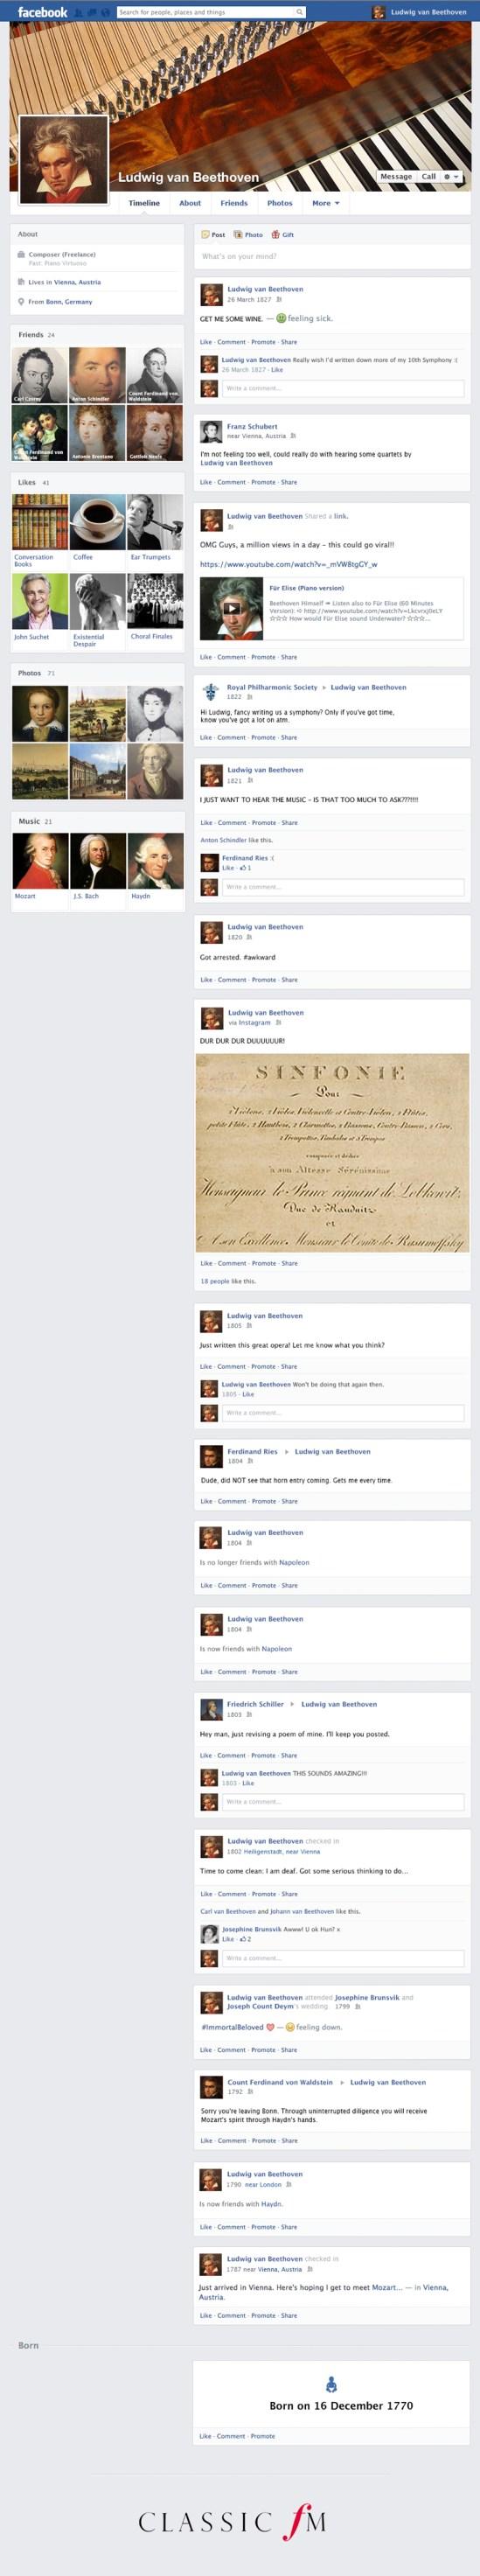 beethovens-facebook